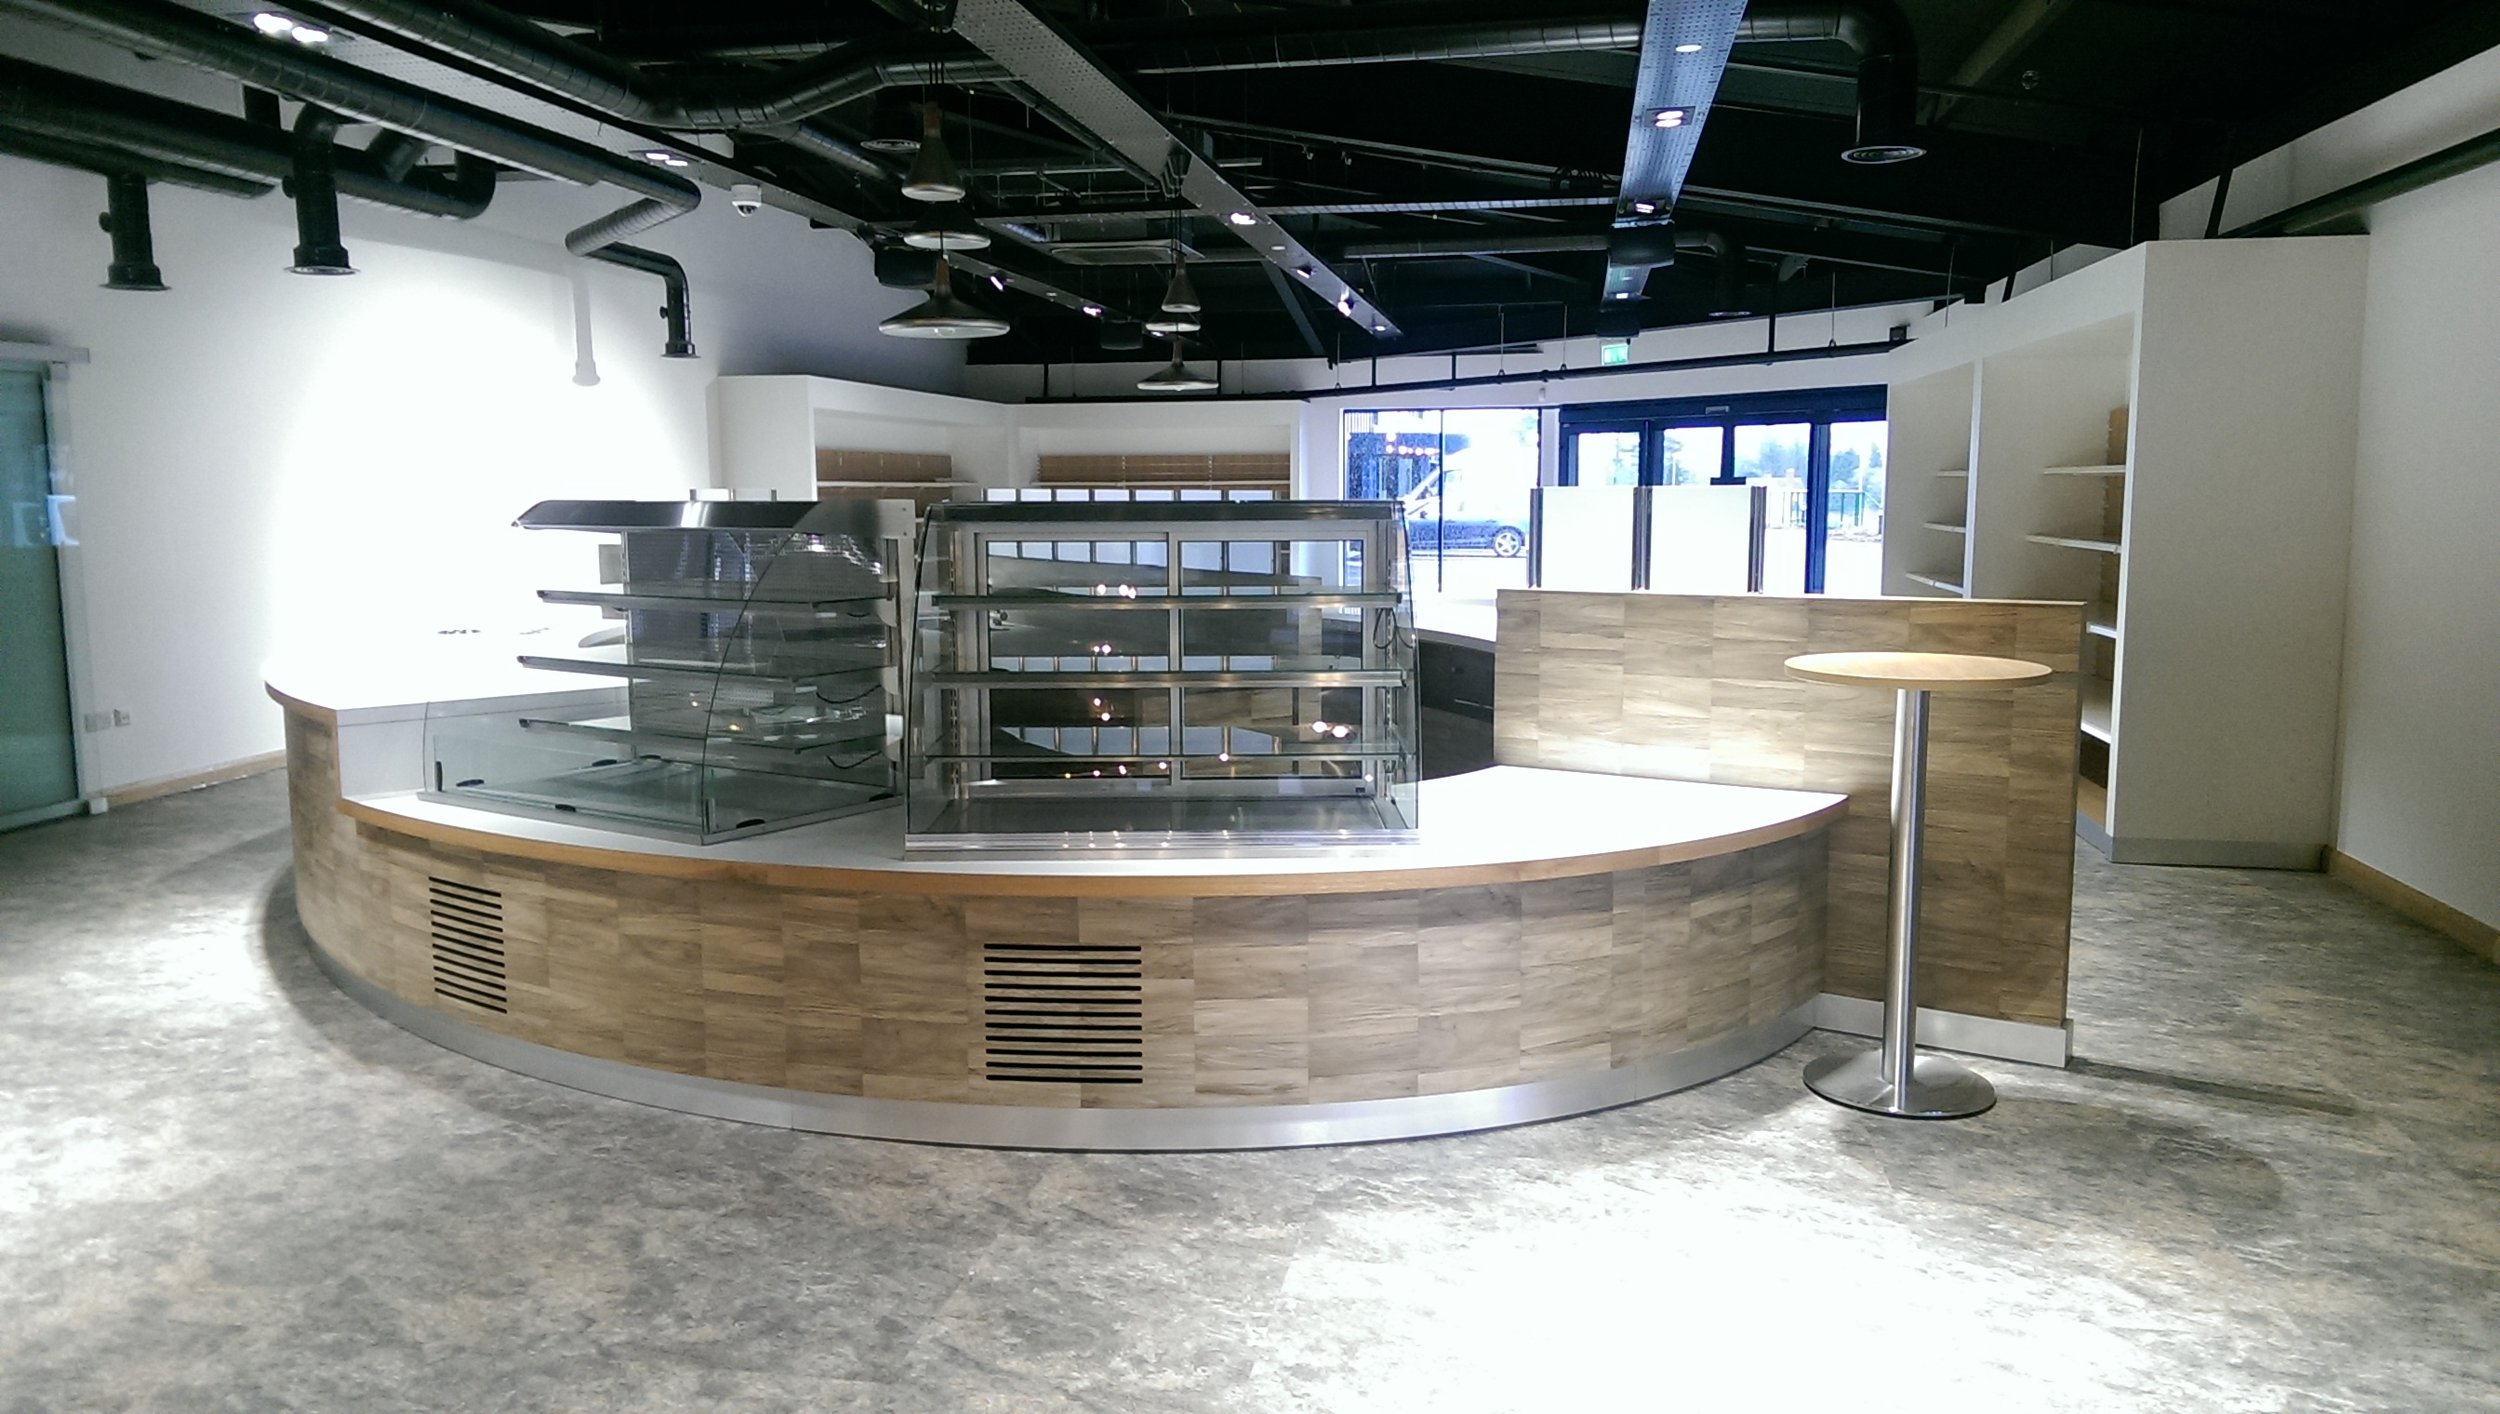 Hillbrush cafeteria servery visitor centre 1